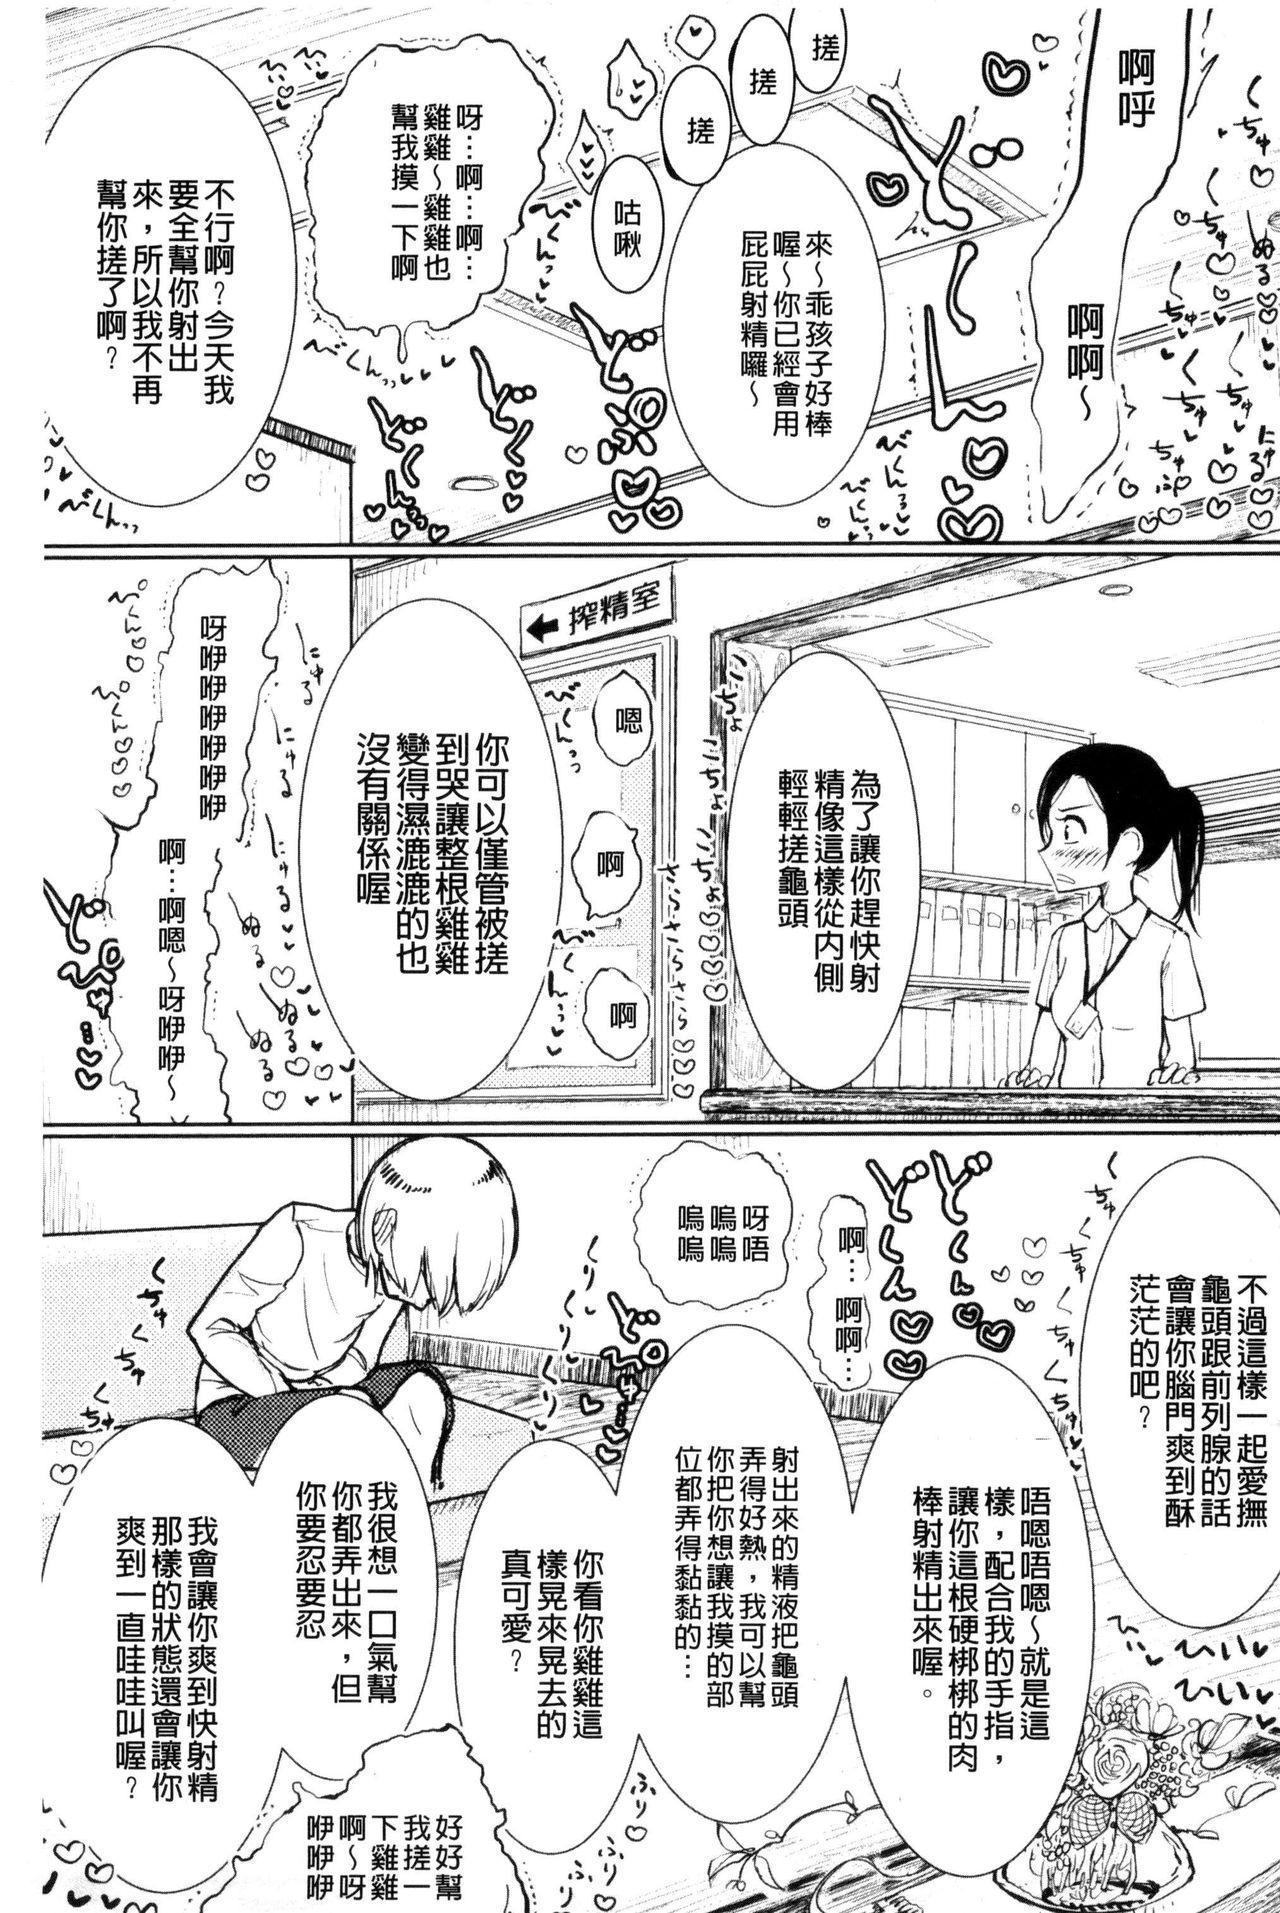 [Dhibi] Sono Yubisaki de Korogashite - Please Caress it at the Finger-tip. [Chinese] 182